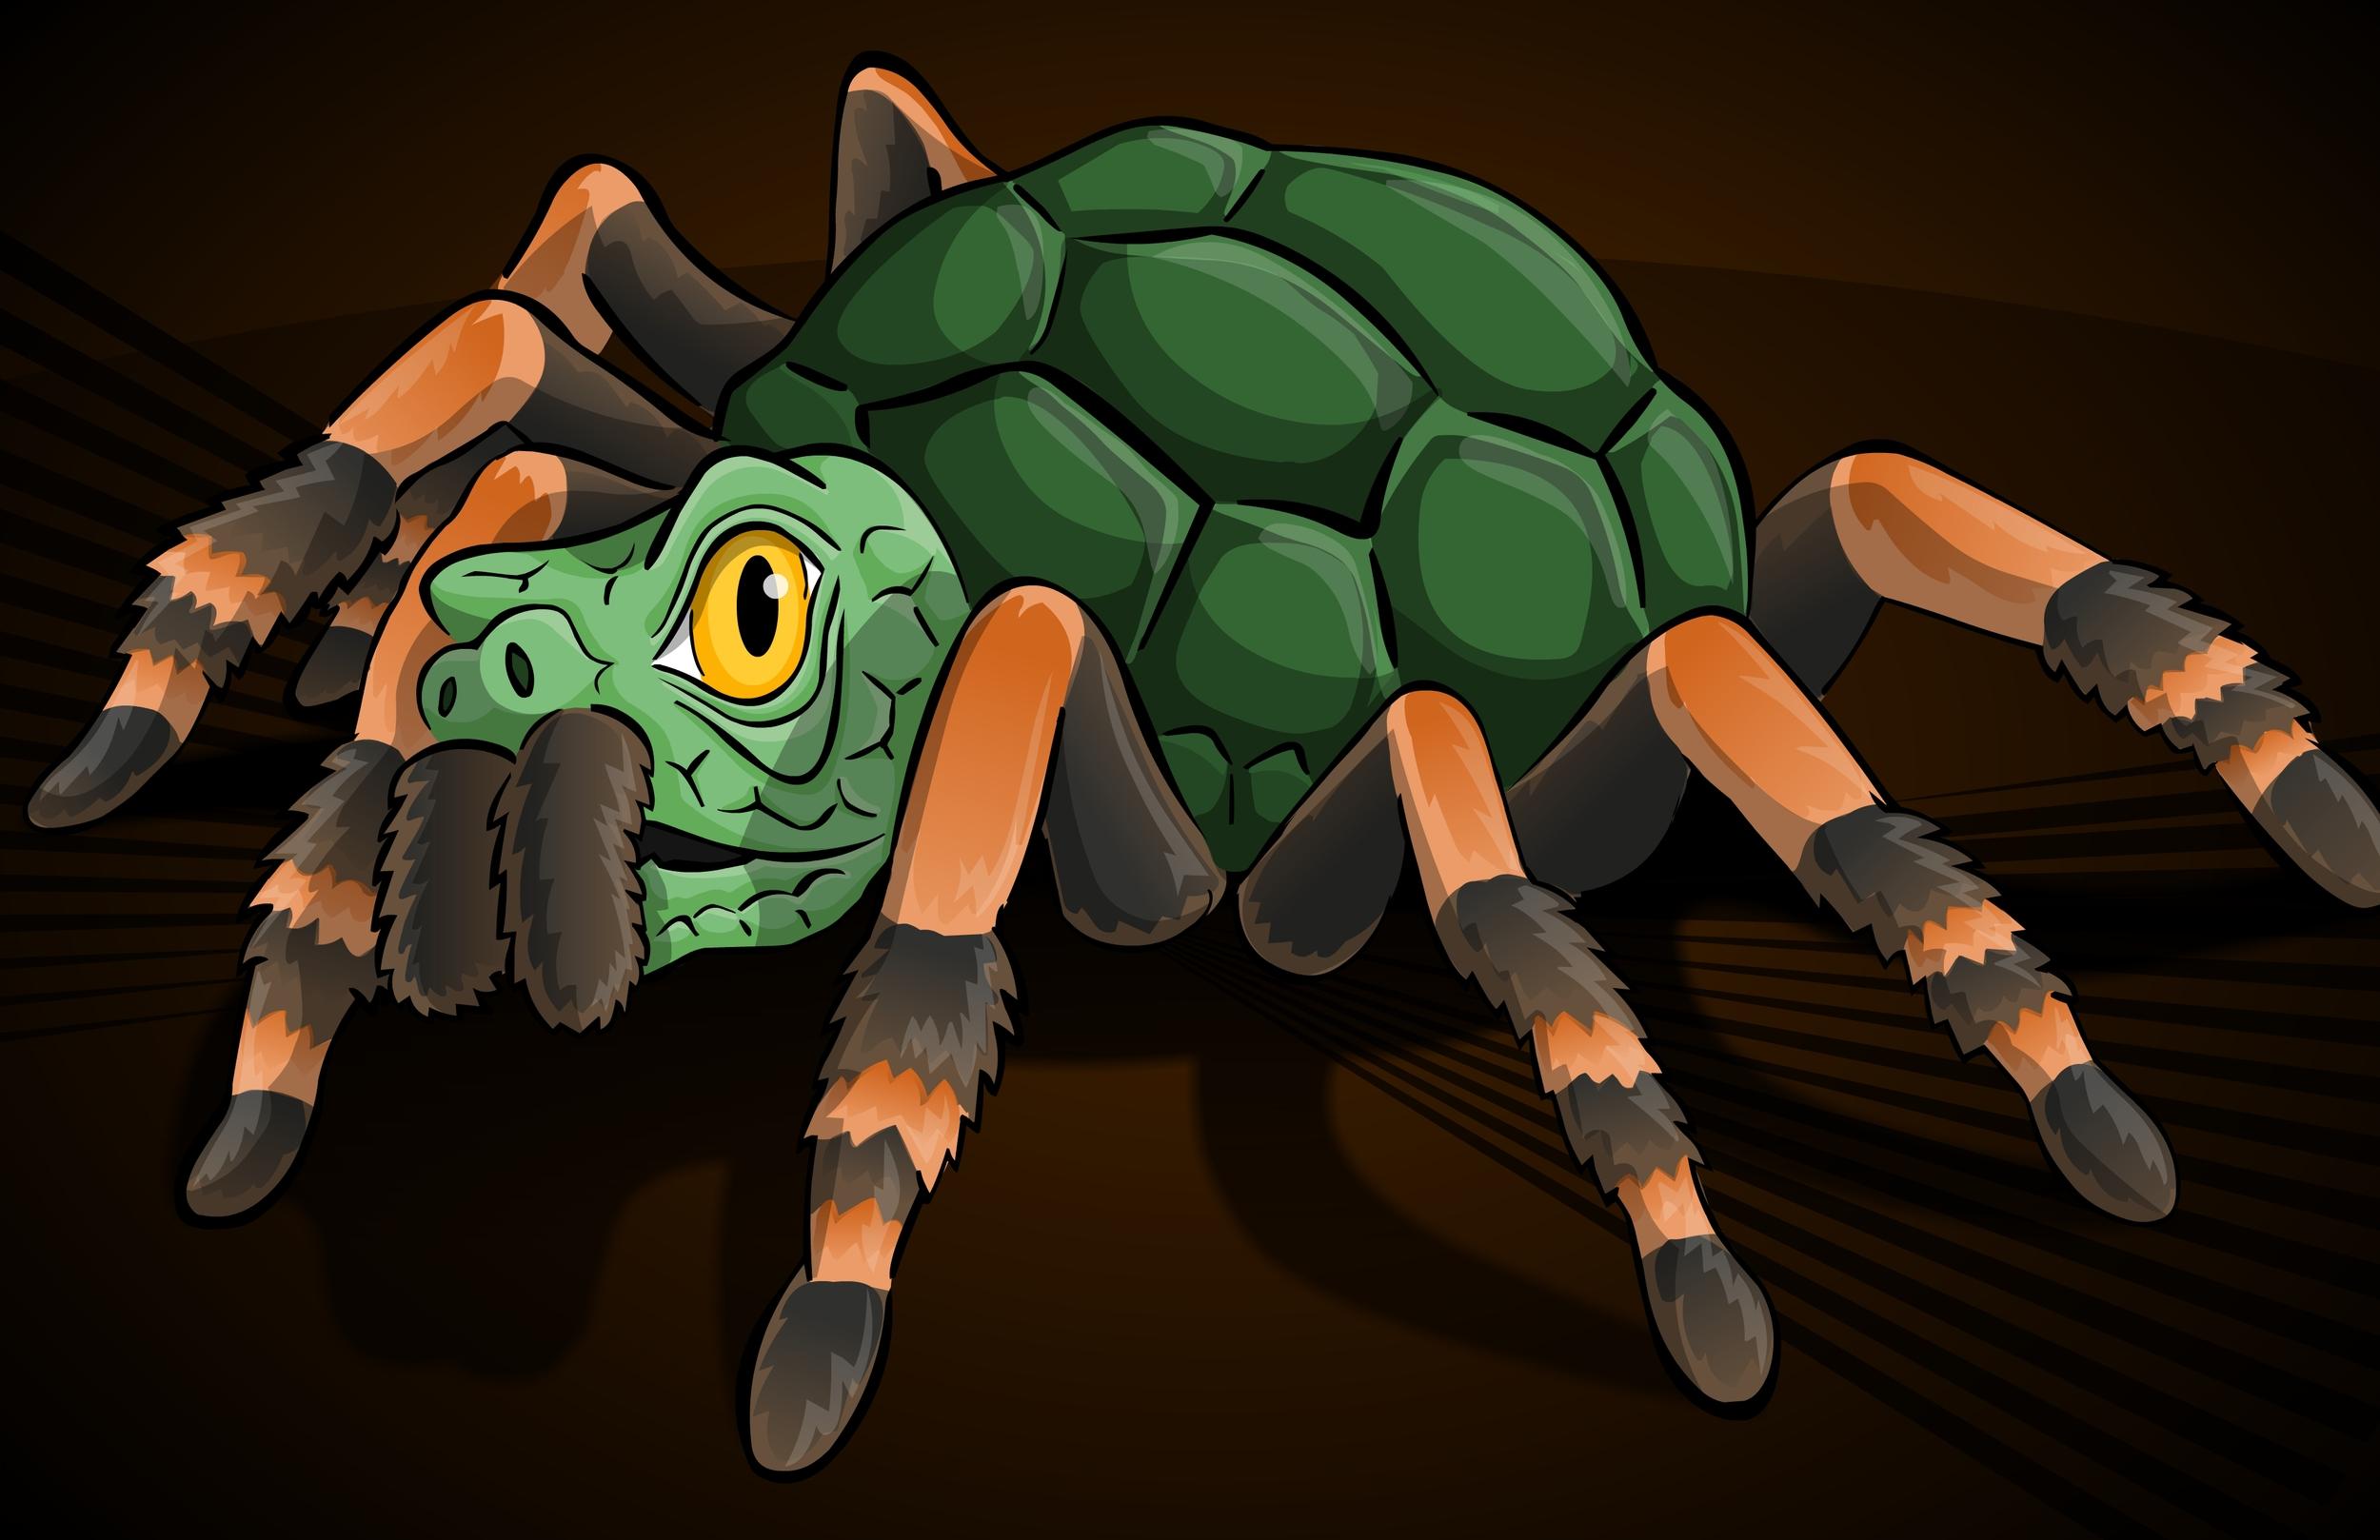 Turtlerantula